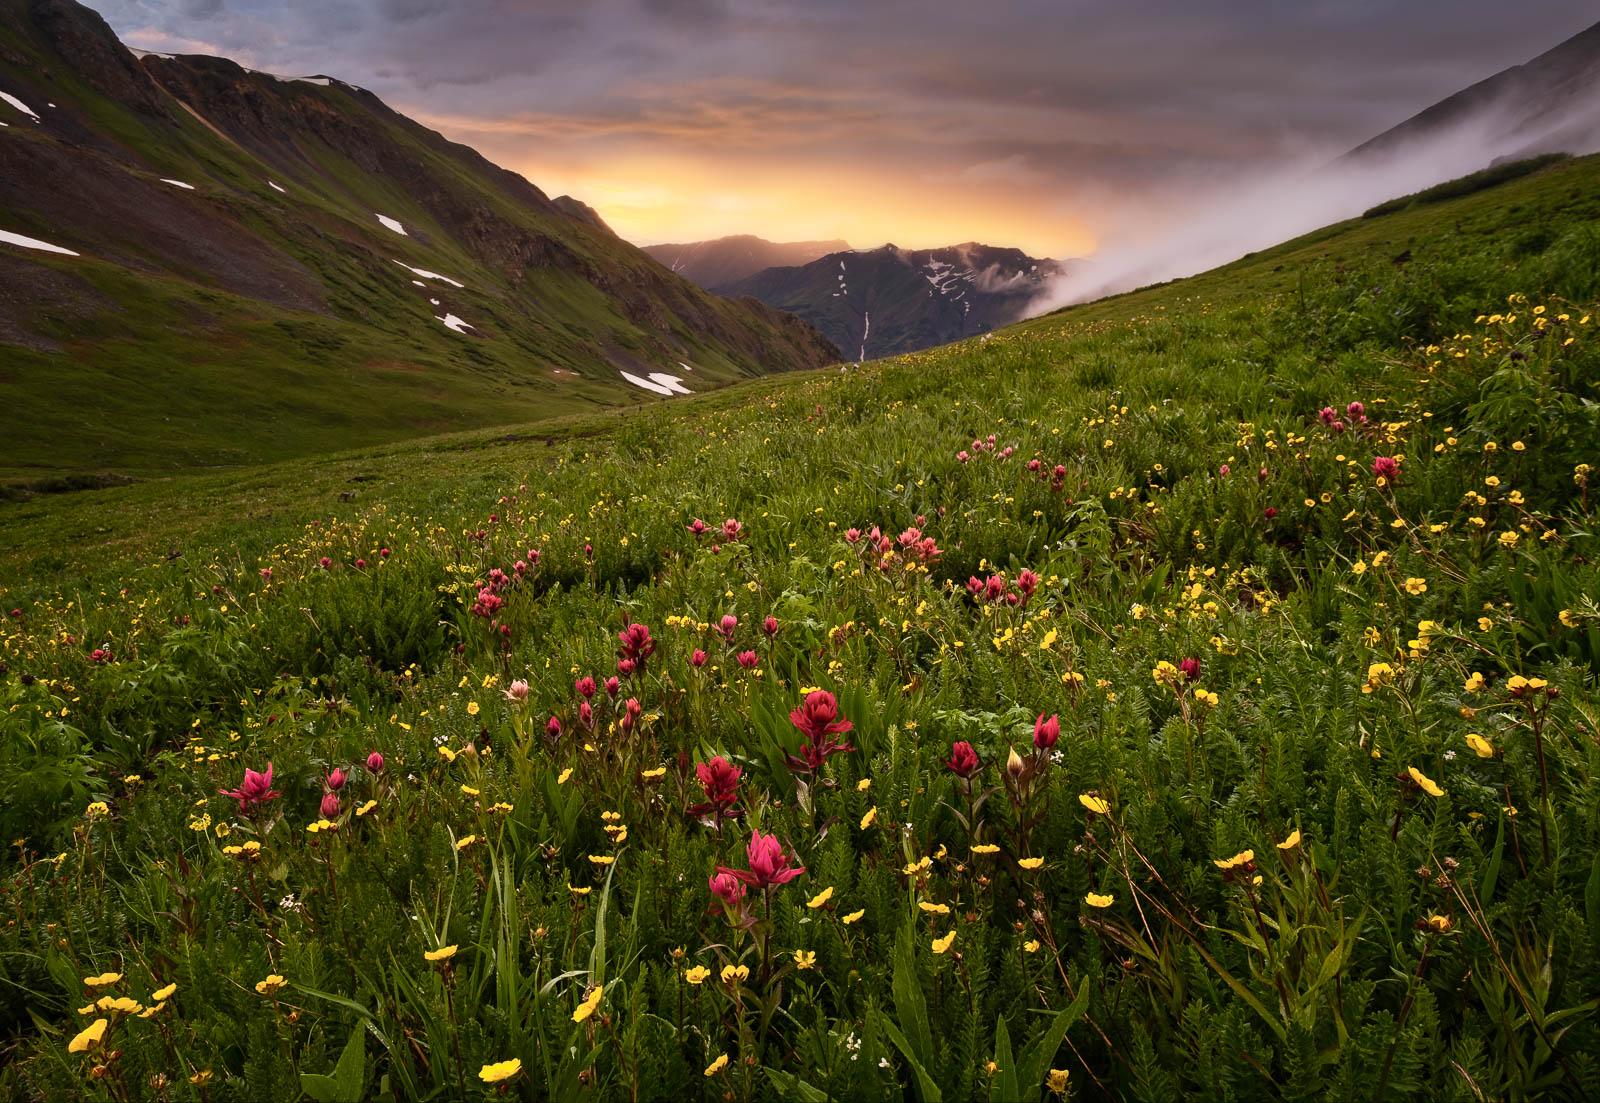 Flower, Time, Wildflower, colorado, fog, green, landscape orientation, mountains, orange, red, san juan mountains, storm, sunset...